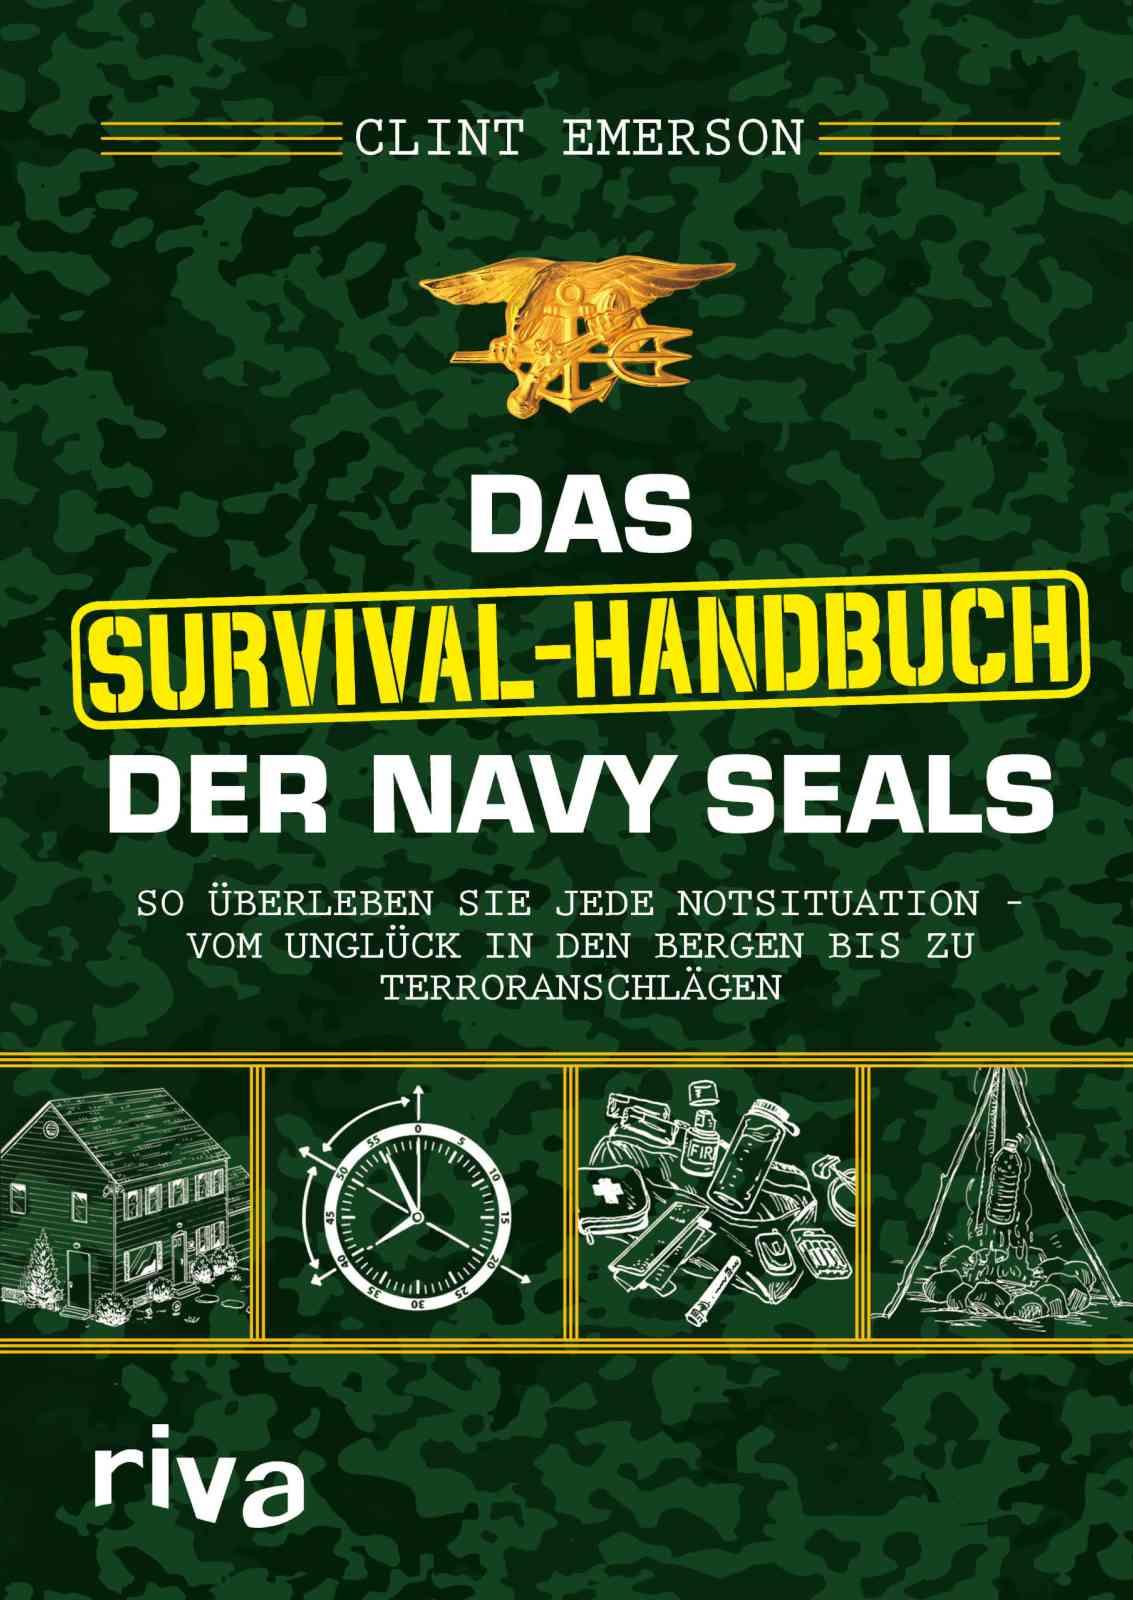 Clint Emerson - Das Survival-Handbuch der Navy-Seals